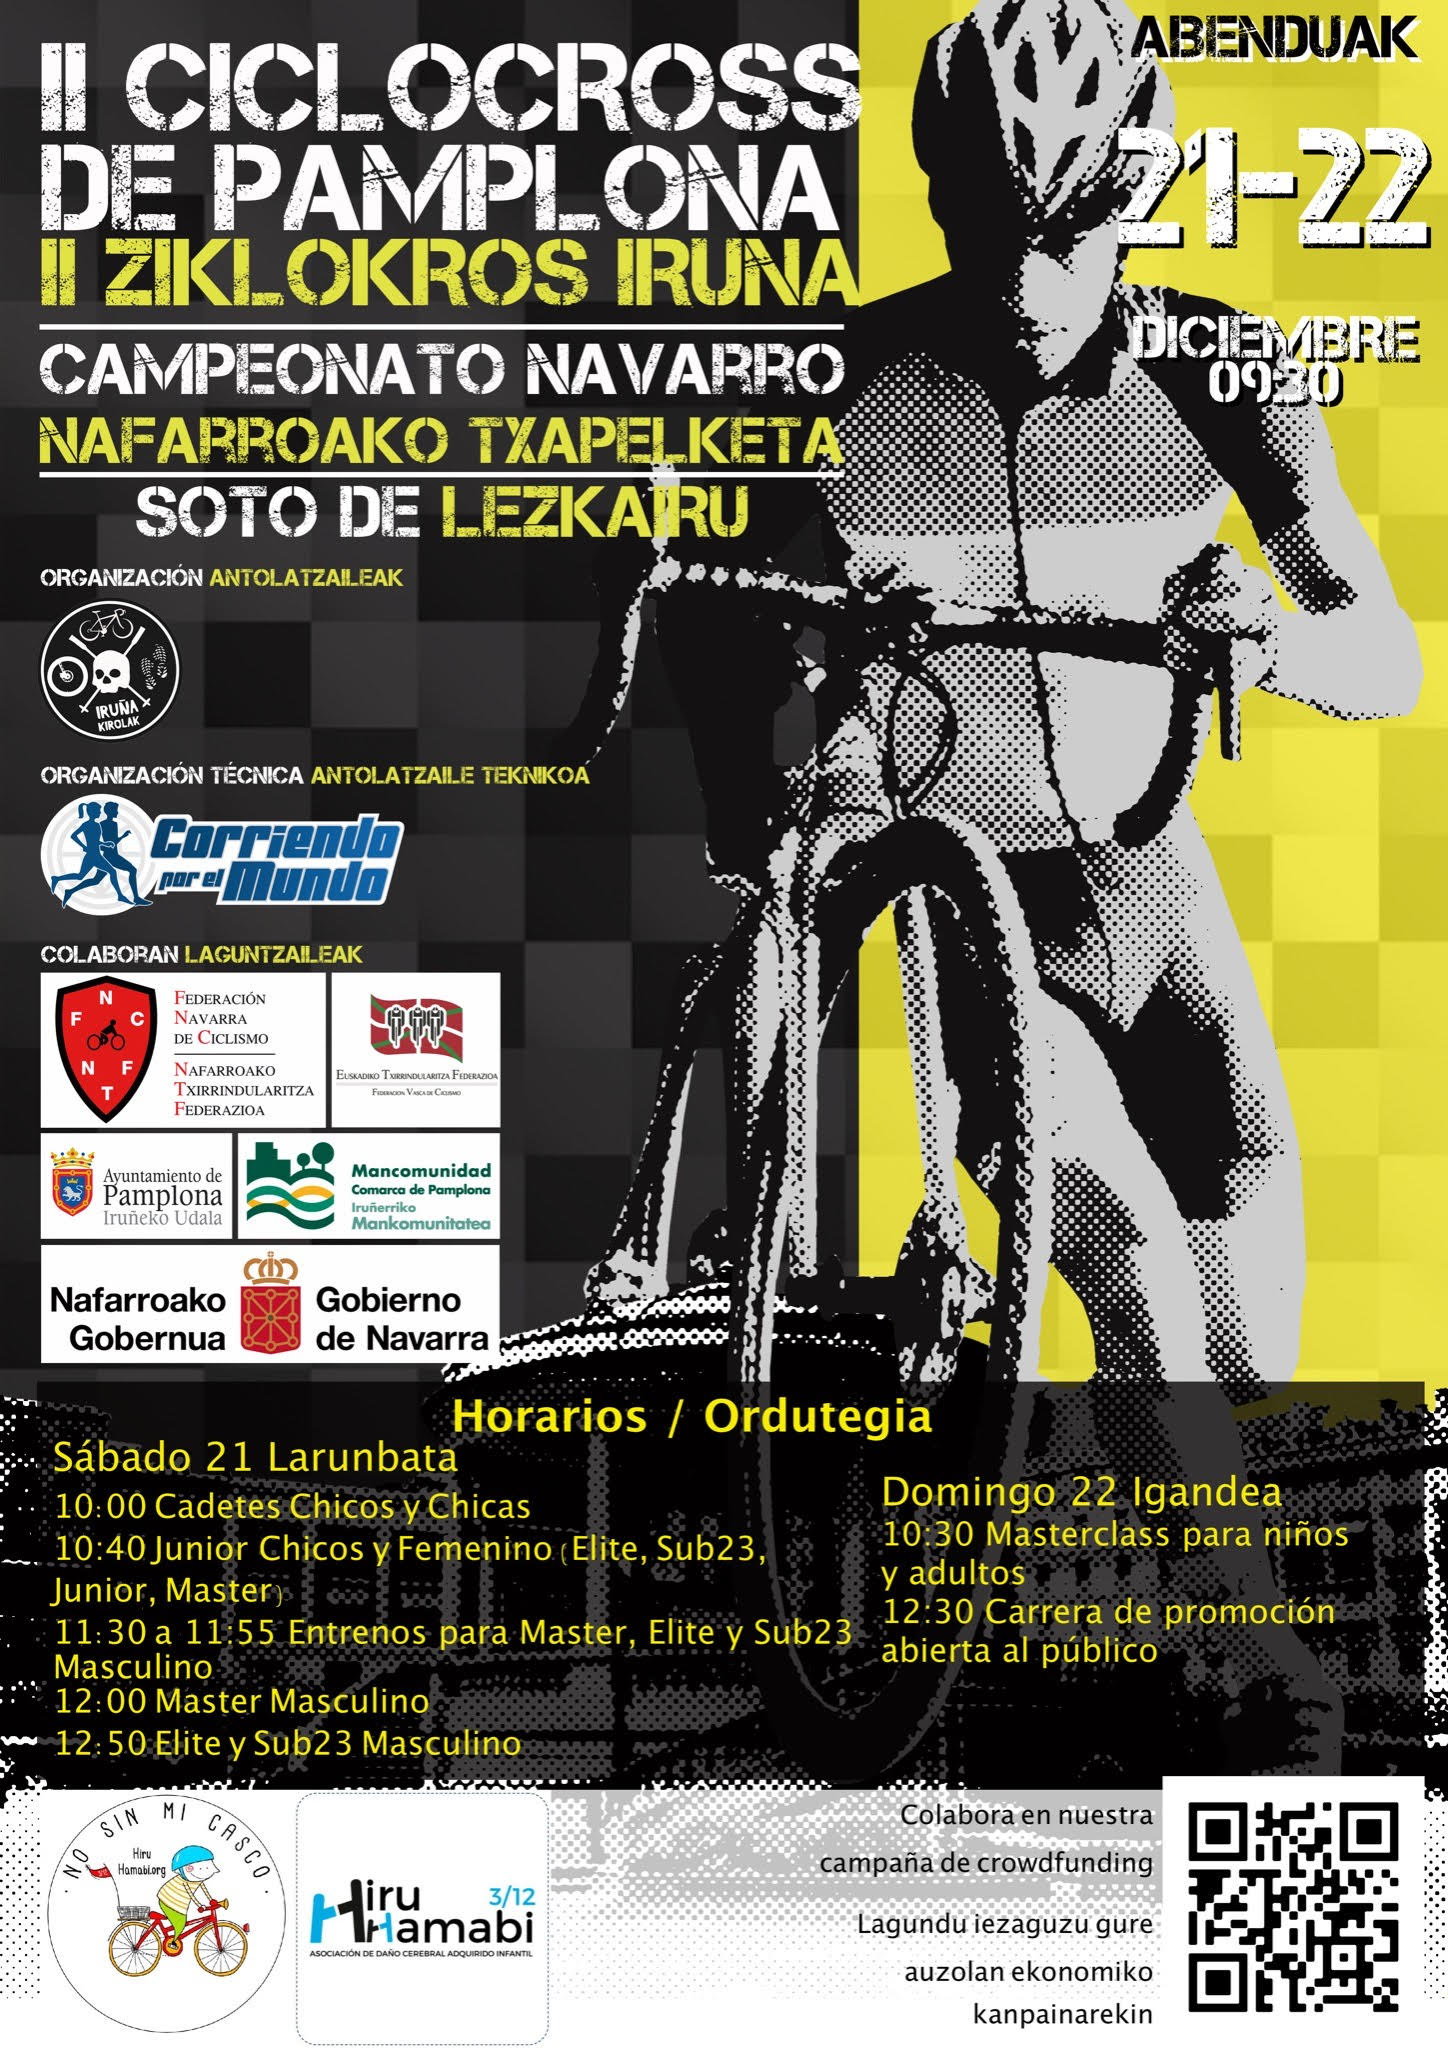 Este fin de semana la II Ciclocross Pamplona en Lezkairu